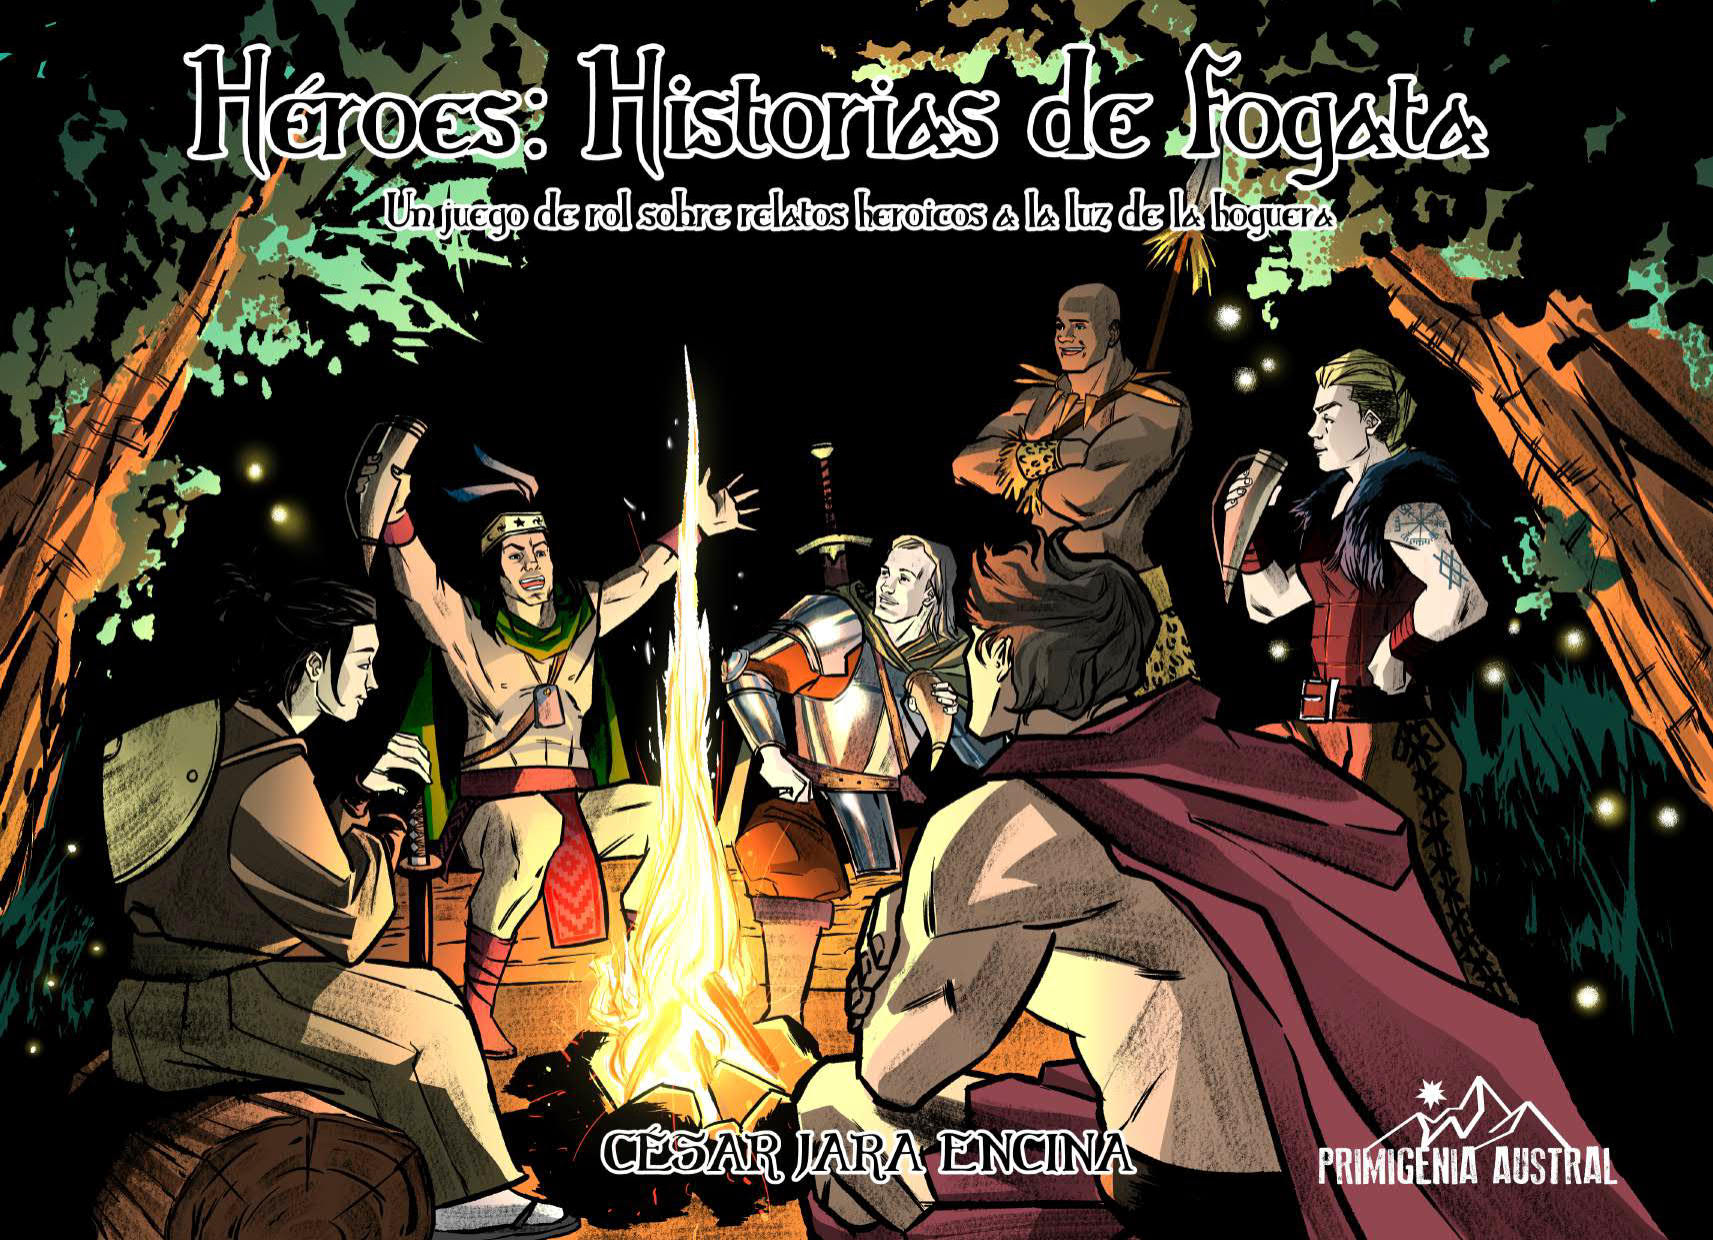 Héroes: historias de fogata